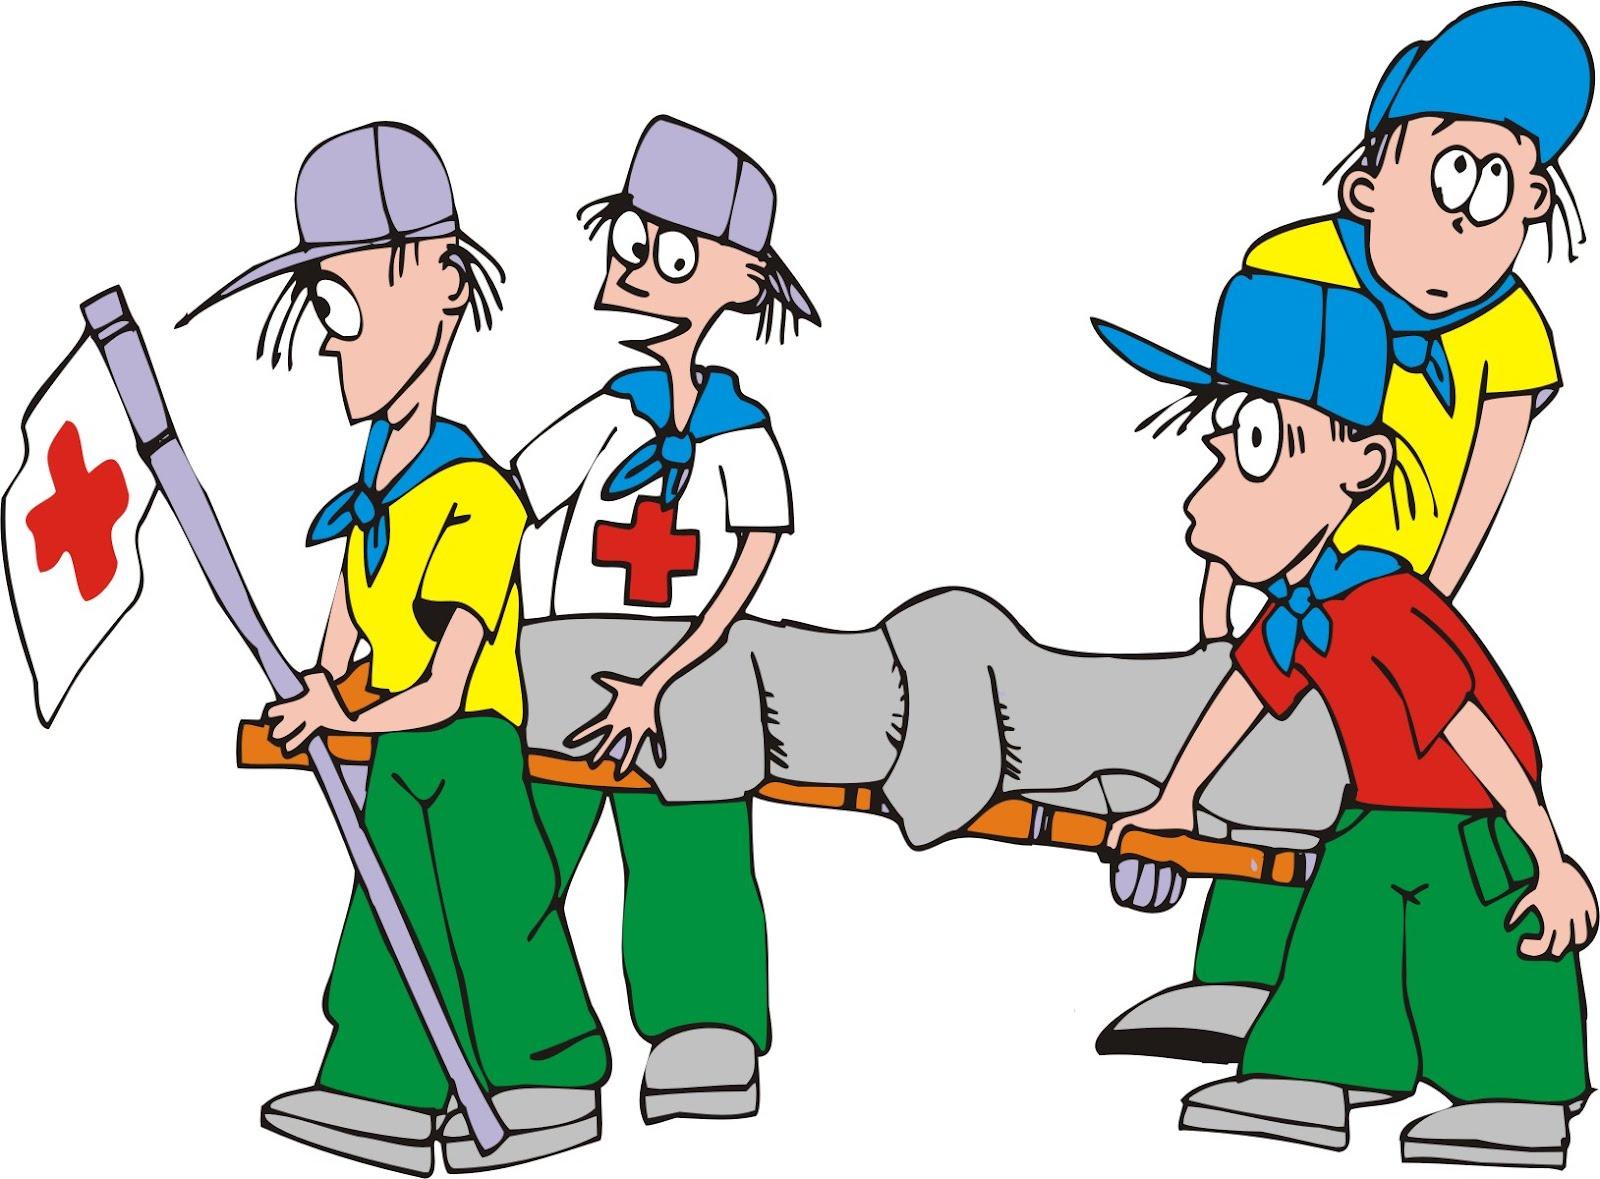 Animasi Kartun Farmasi Gambar Kartun